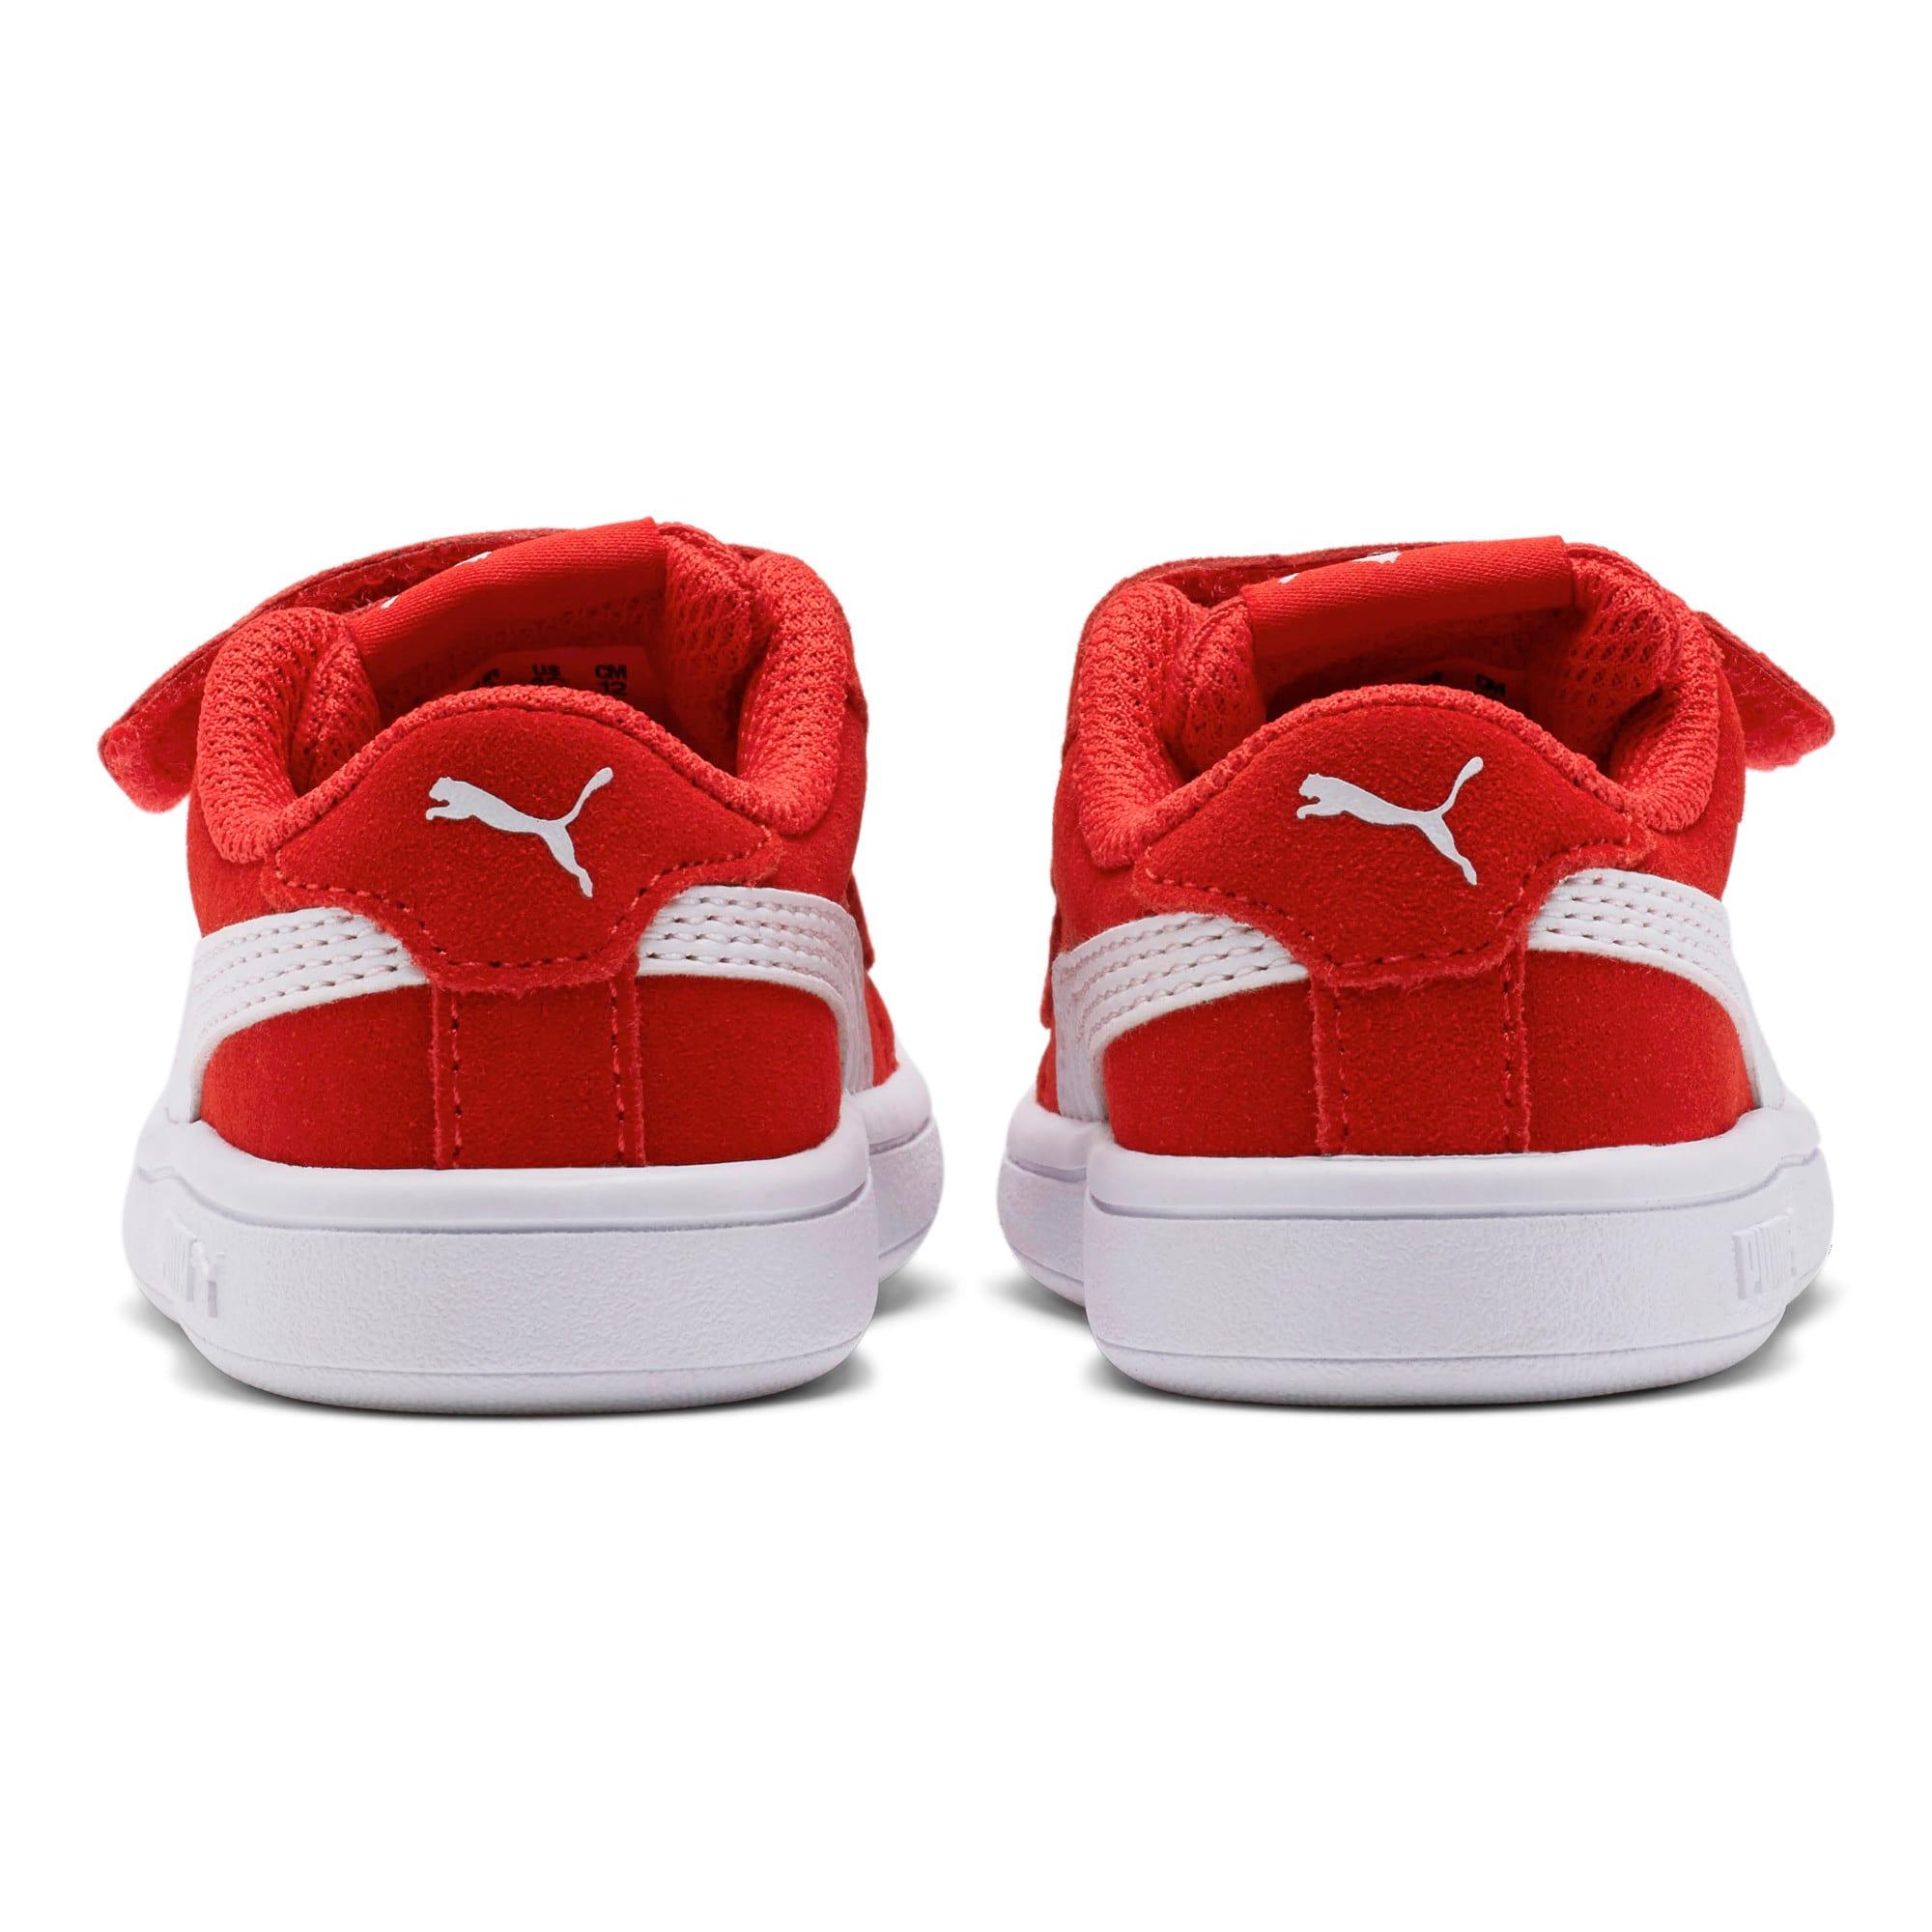 Thumbnail 4 of PUMA Smash v2 Suede Toddler Shoes, High Risk Red-Puma White, medium